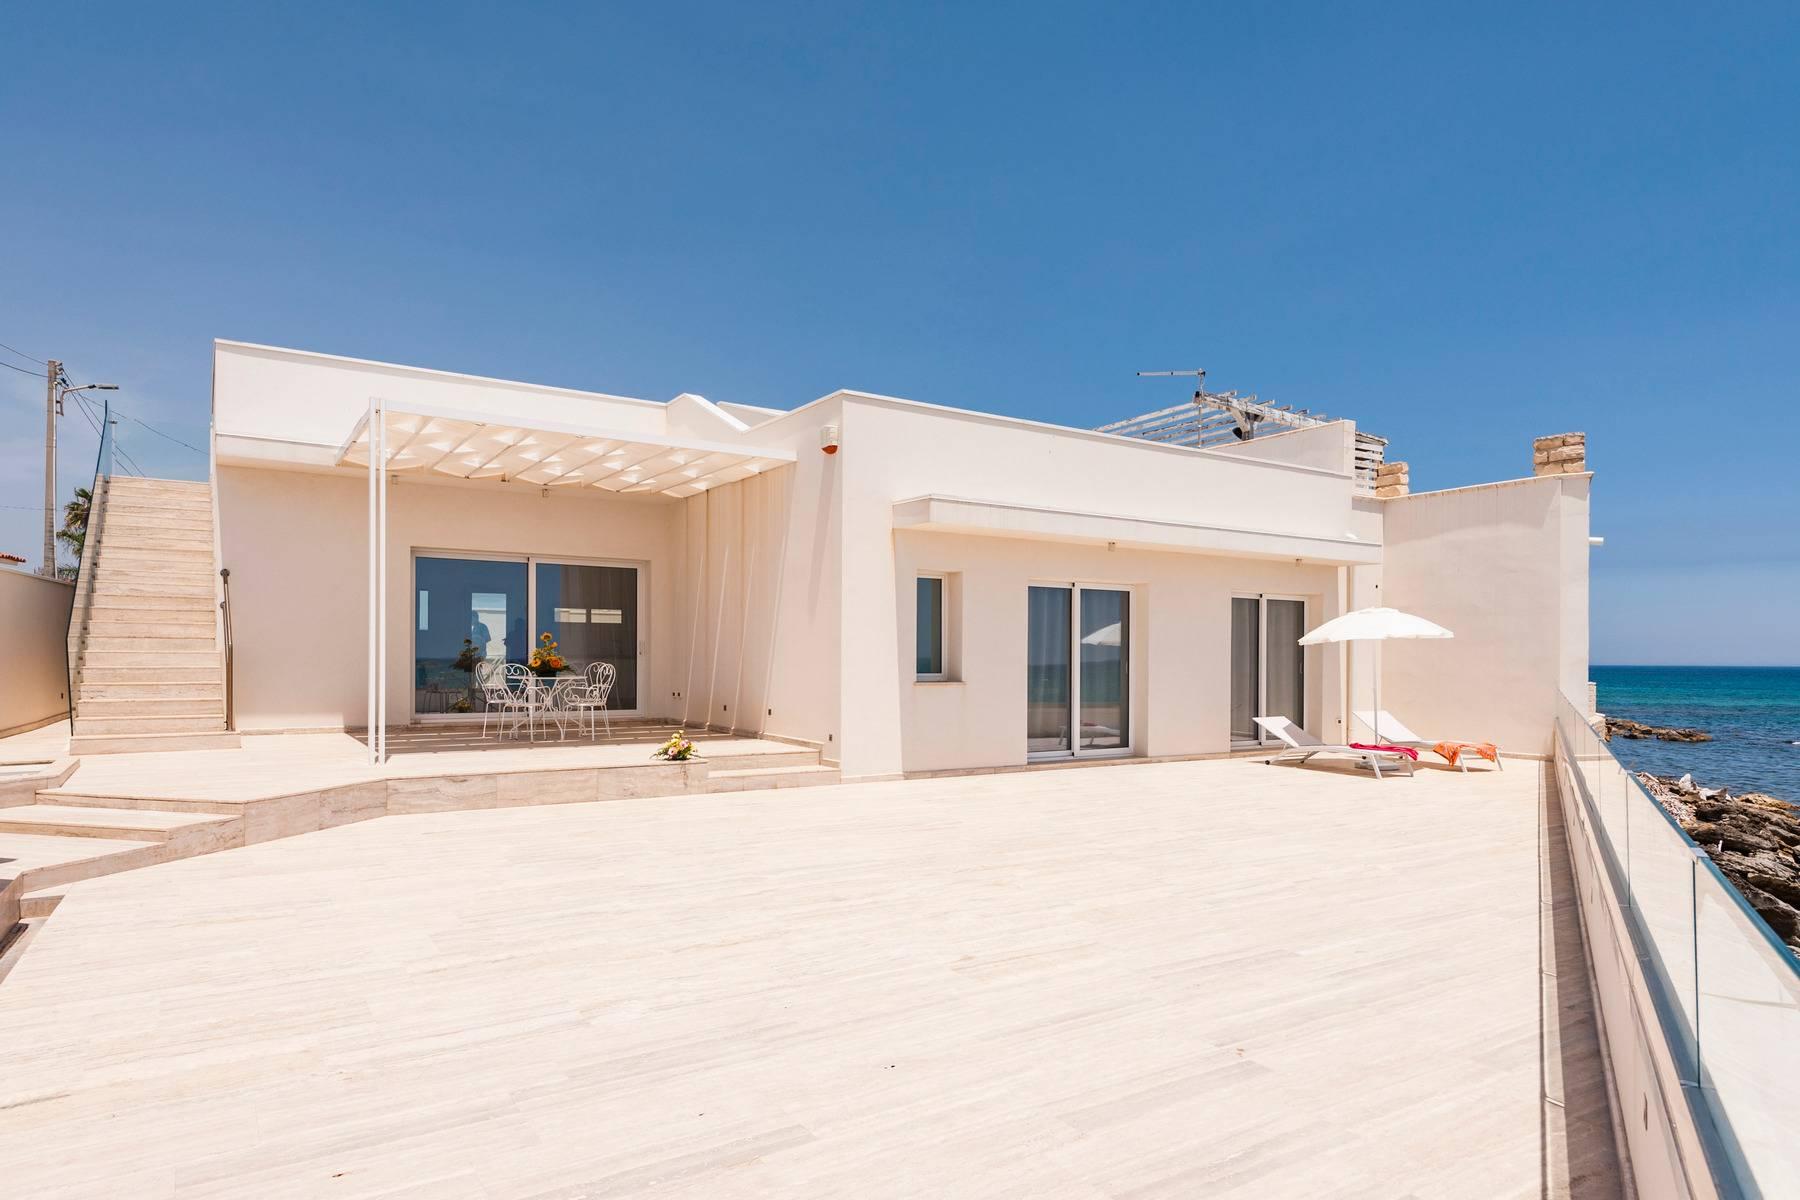 Casa indipendente in Vendita a Avola: 5 locali, 131 mq - Foto 4